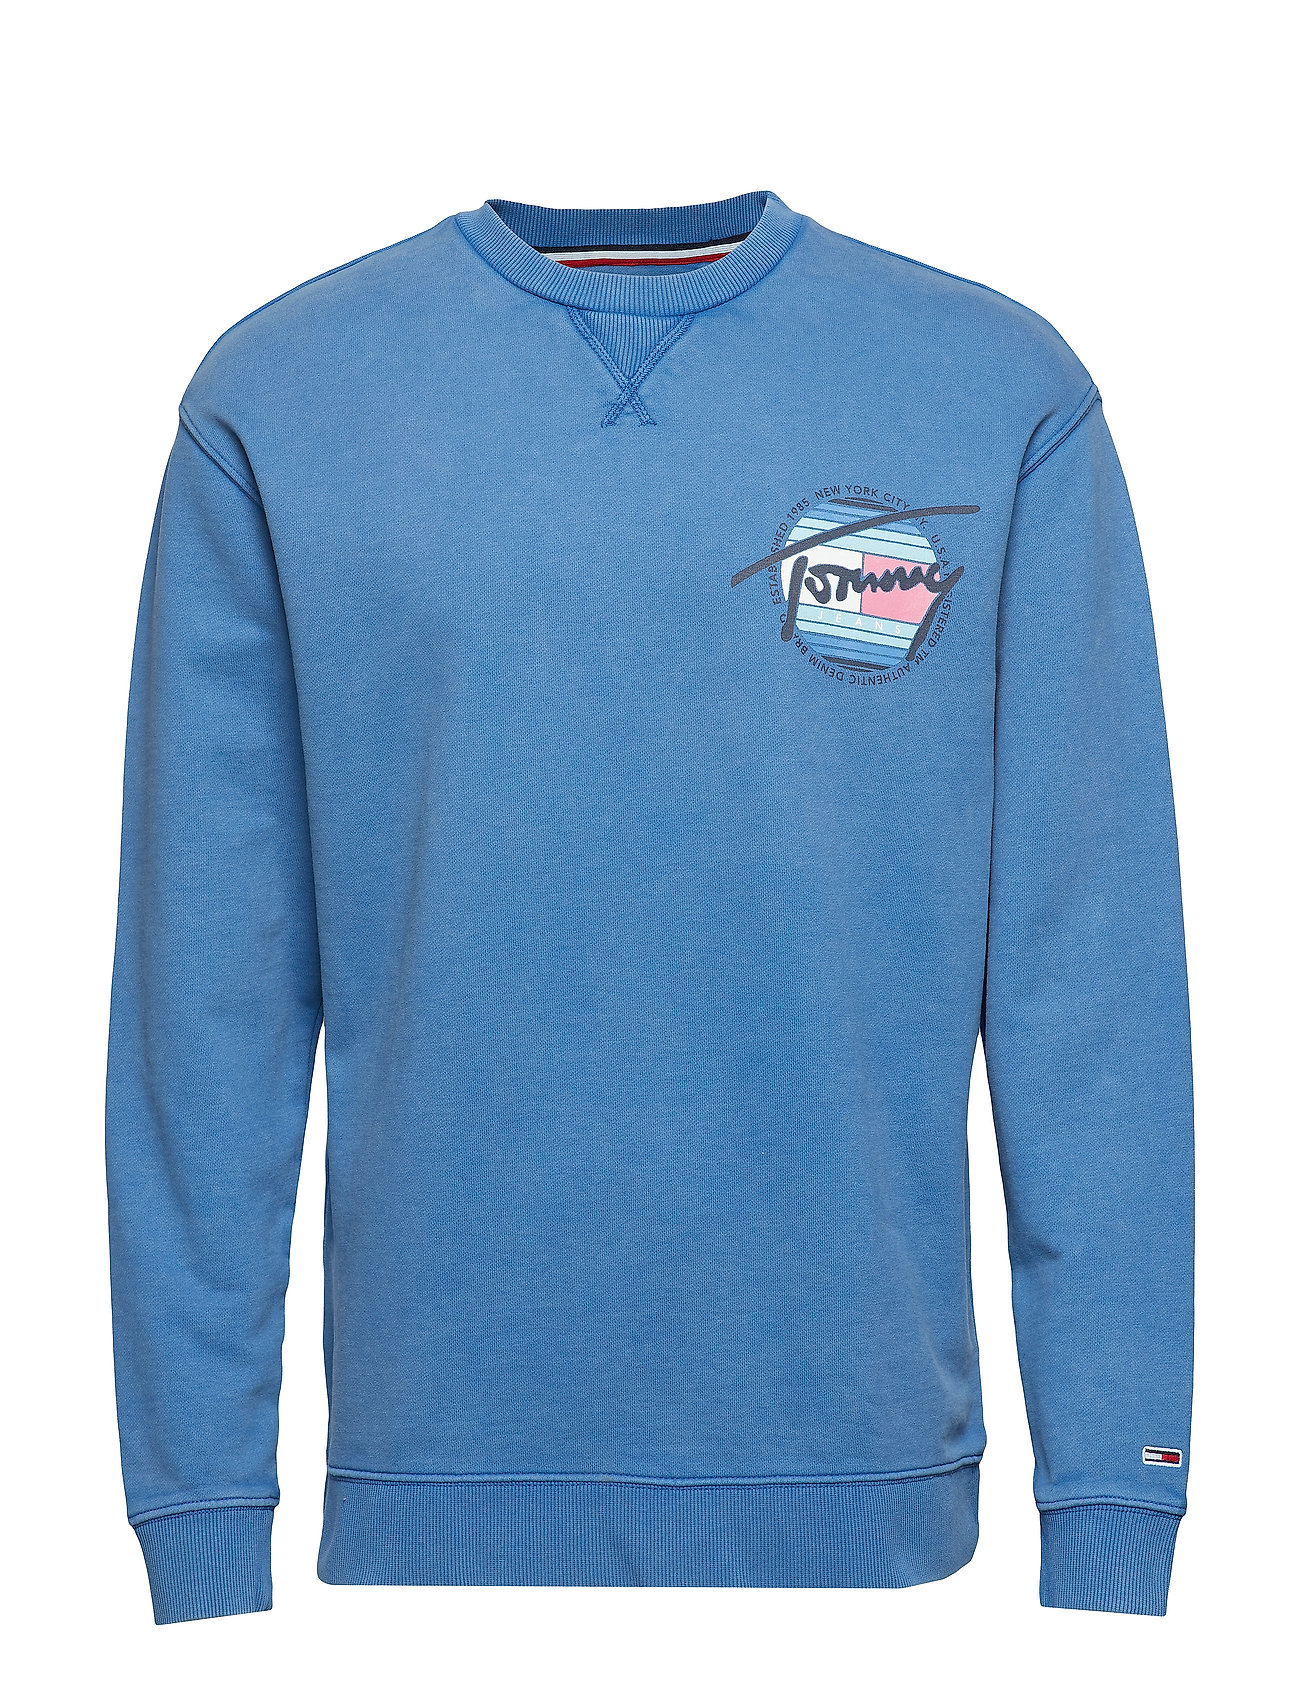 Tommy Jeans TJM LIGHT WASHED CRE - FEDERAL BLUE